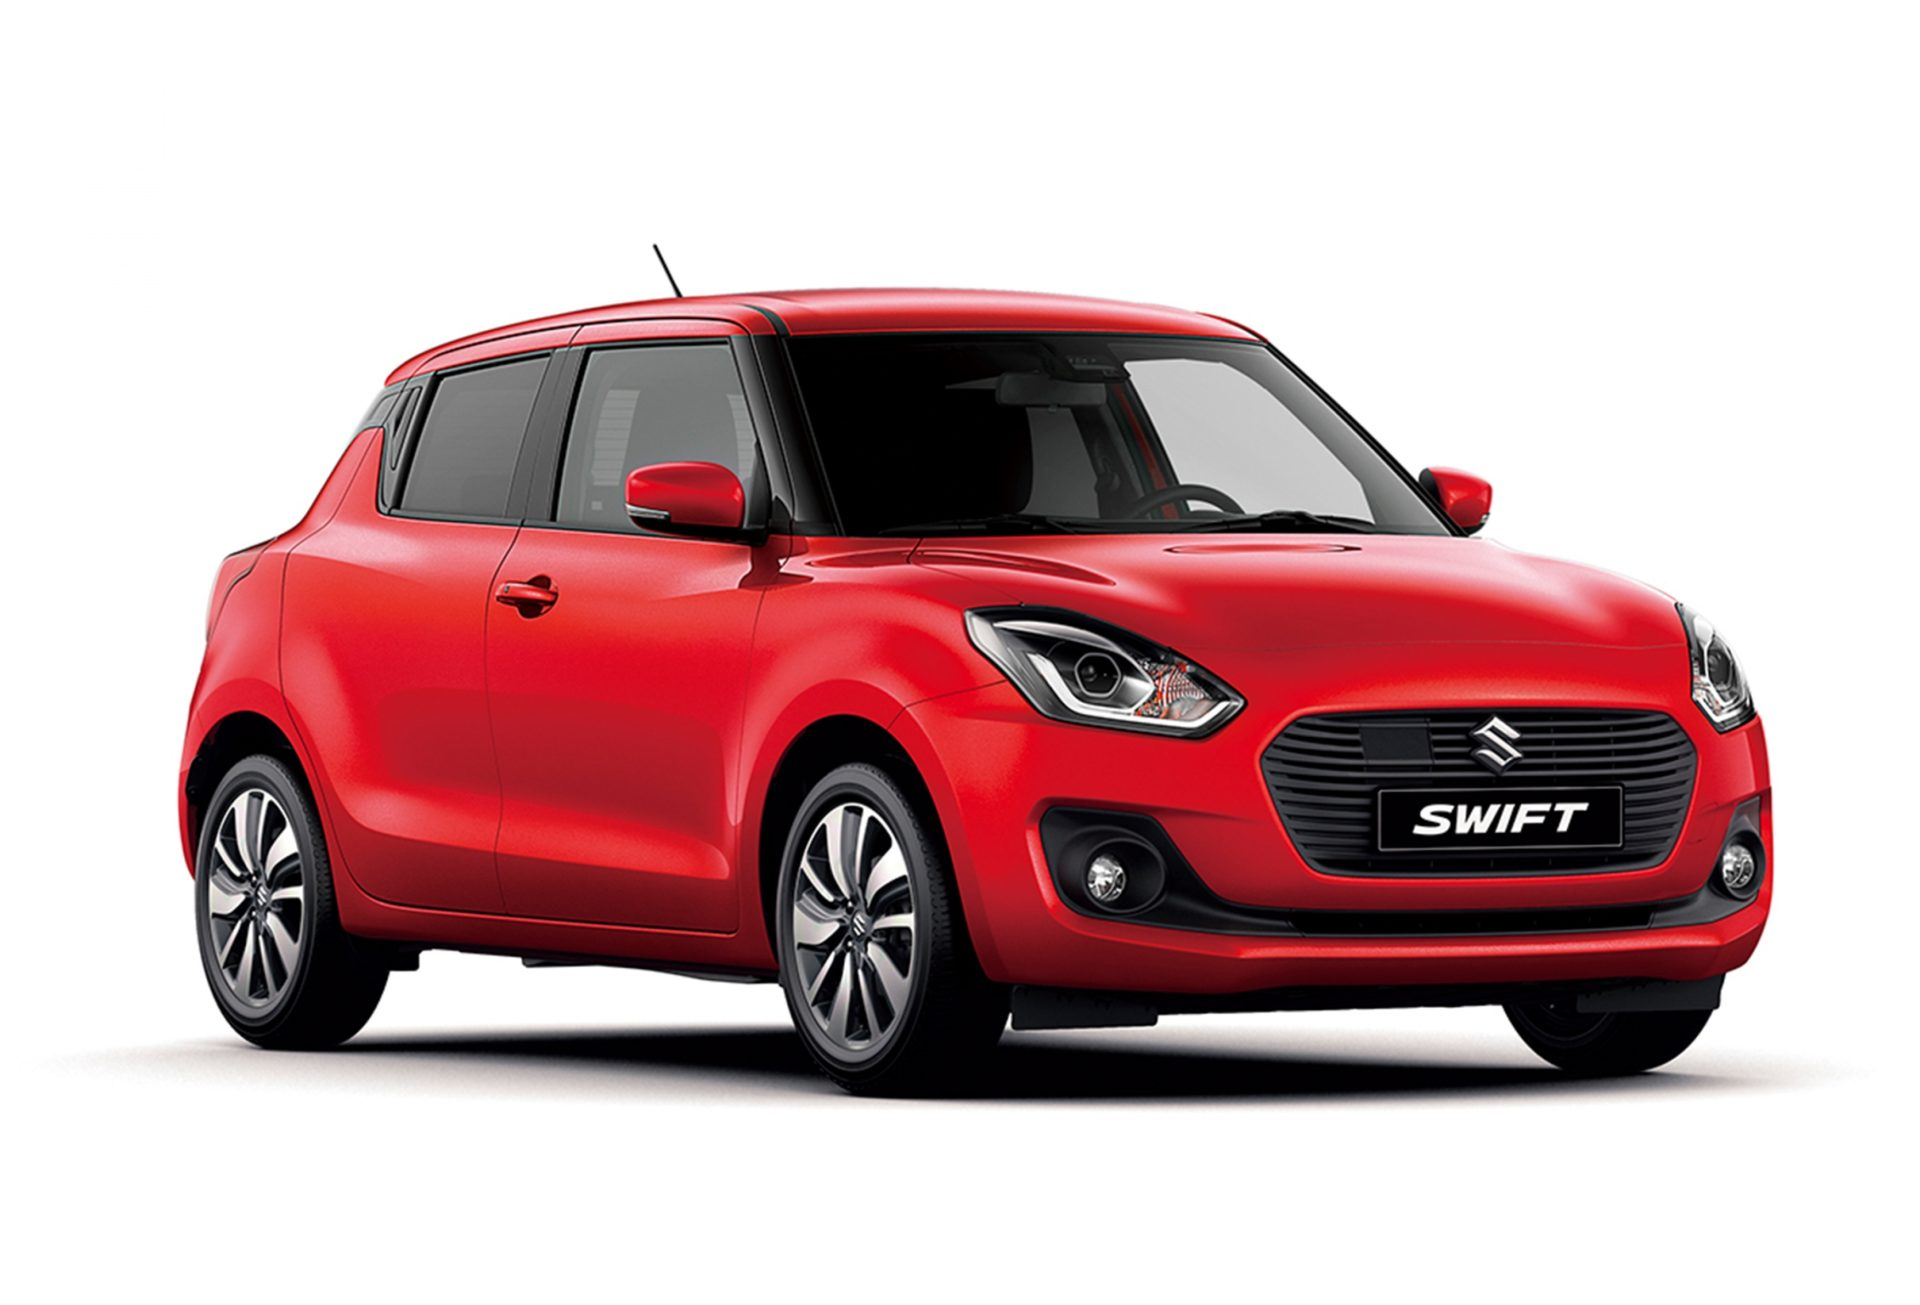 All-new Suzuki Swift Unveiled at 2017 Geneva Motor Show